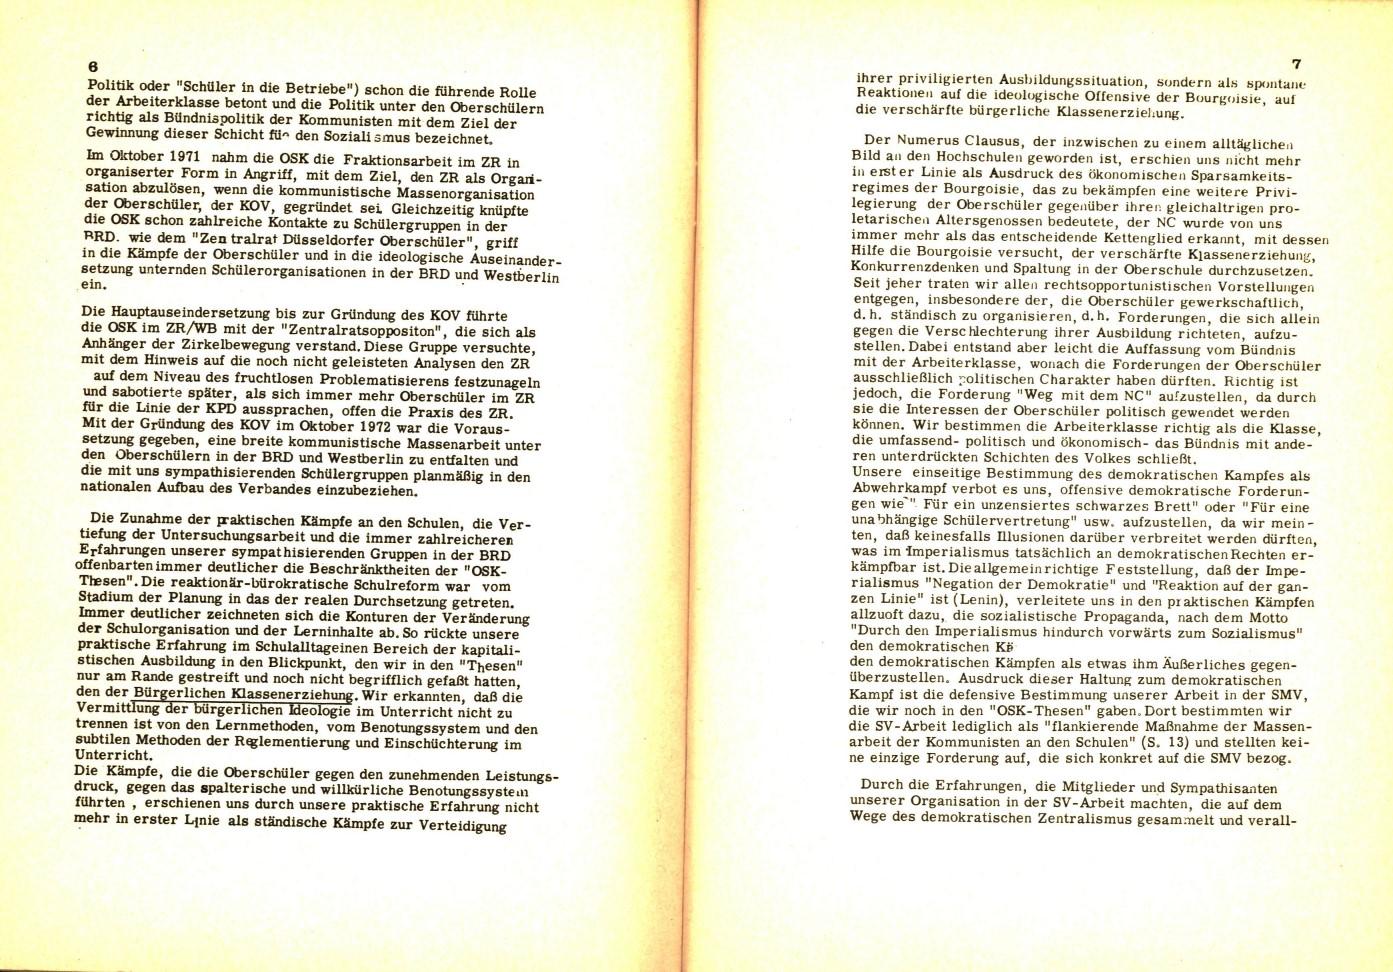 KOV_1973_Aktionsprogramm_06